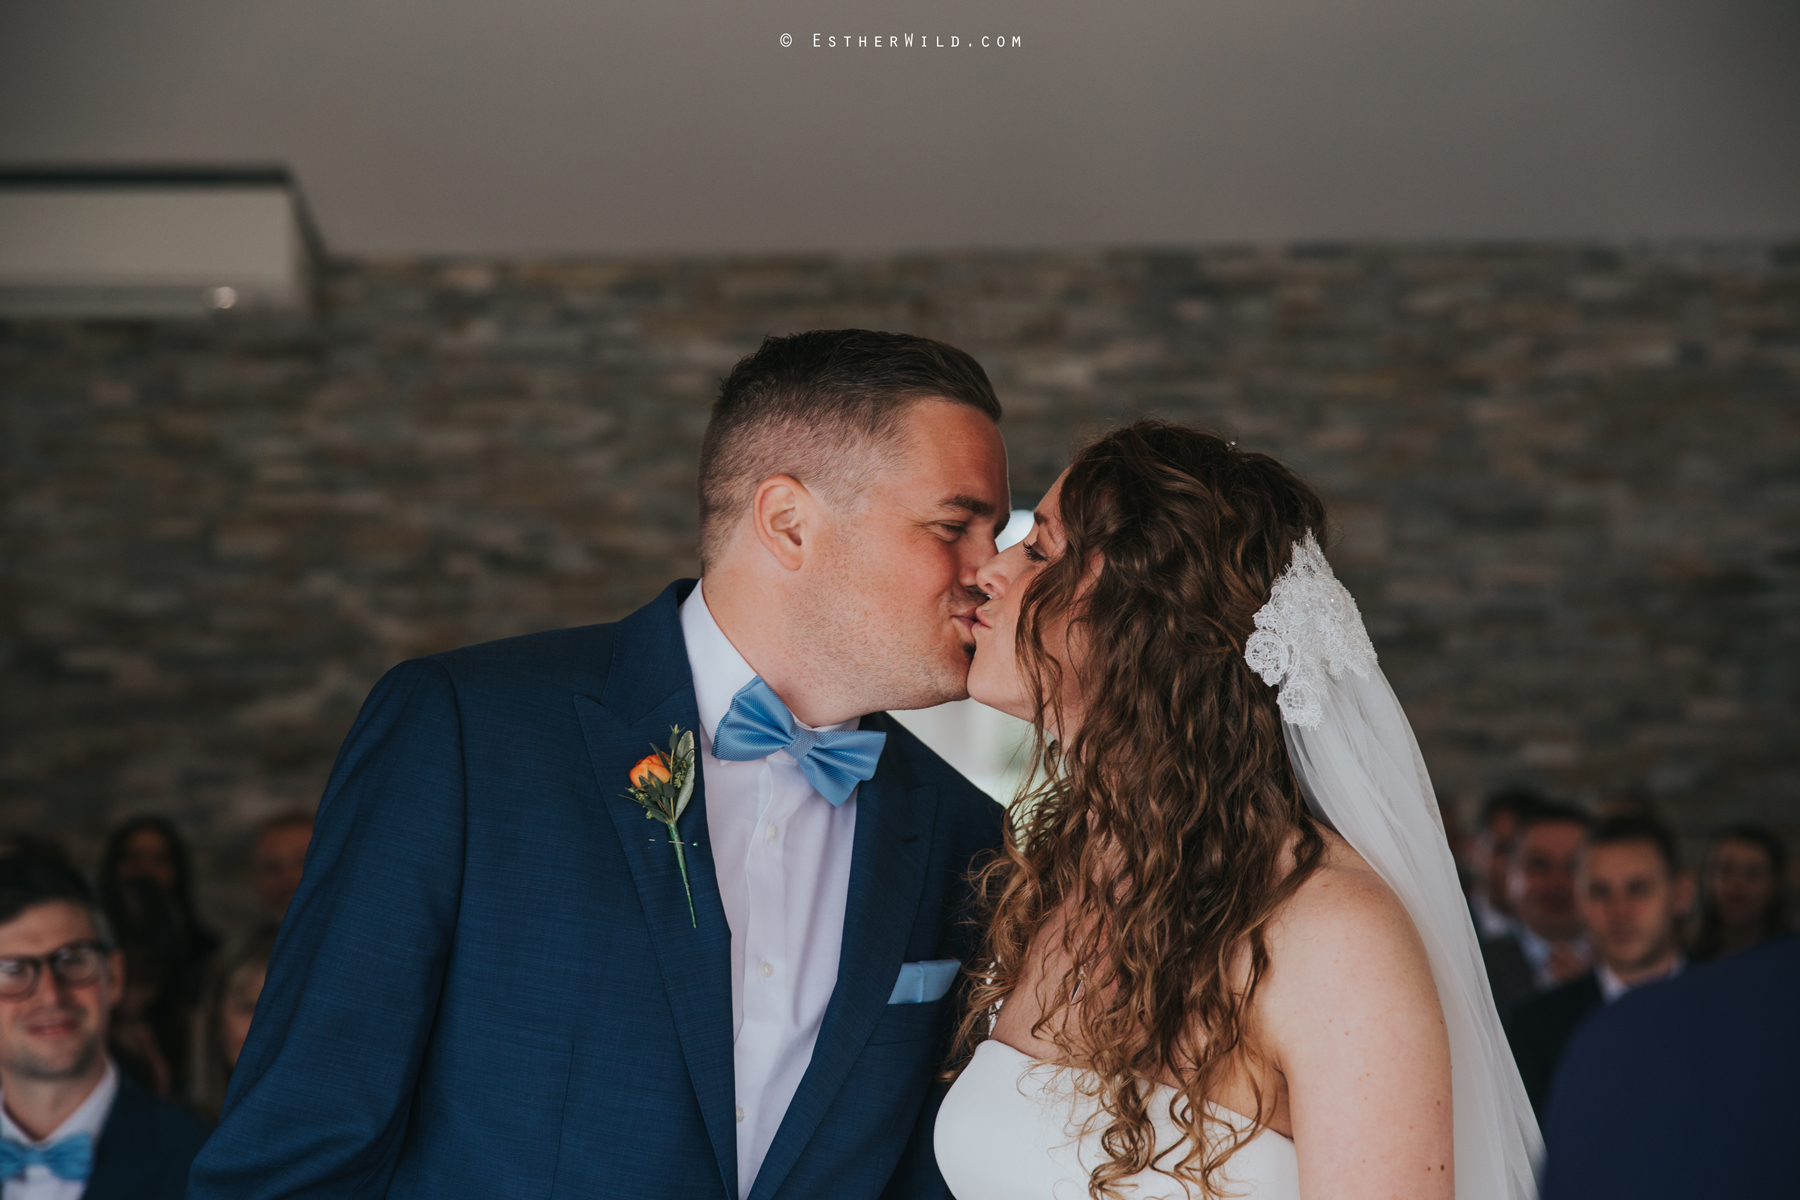 The_BoatHouse_Wedding_Venue_Ormesby_Norfolk_Broads_Boat_Wedding_Photography_Esther_Wild_Photographer_IMG_1163.jpg